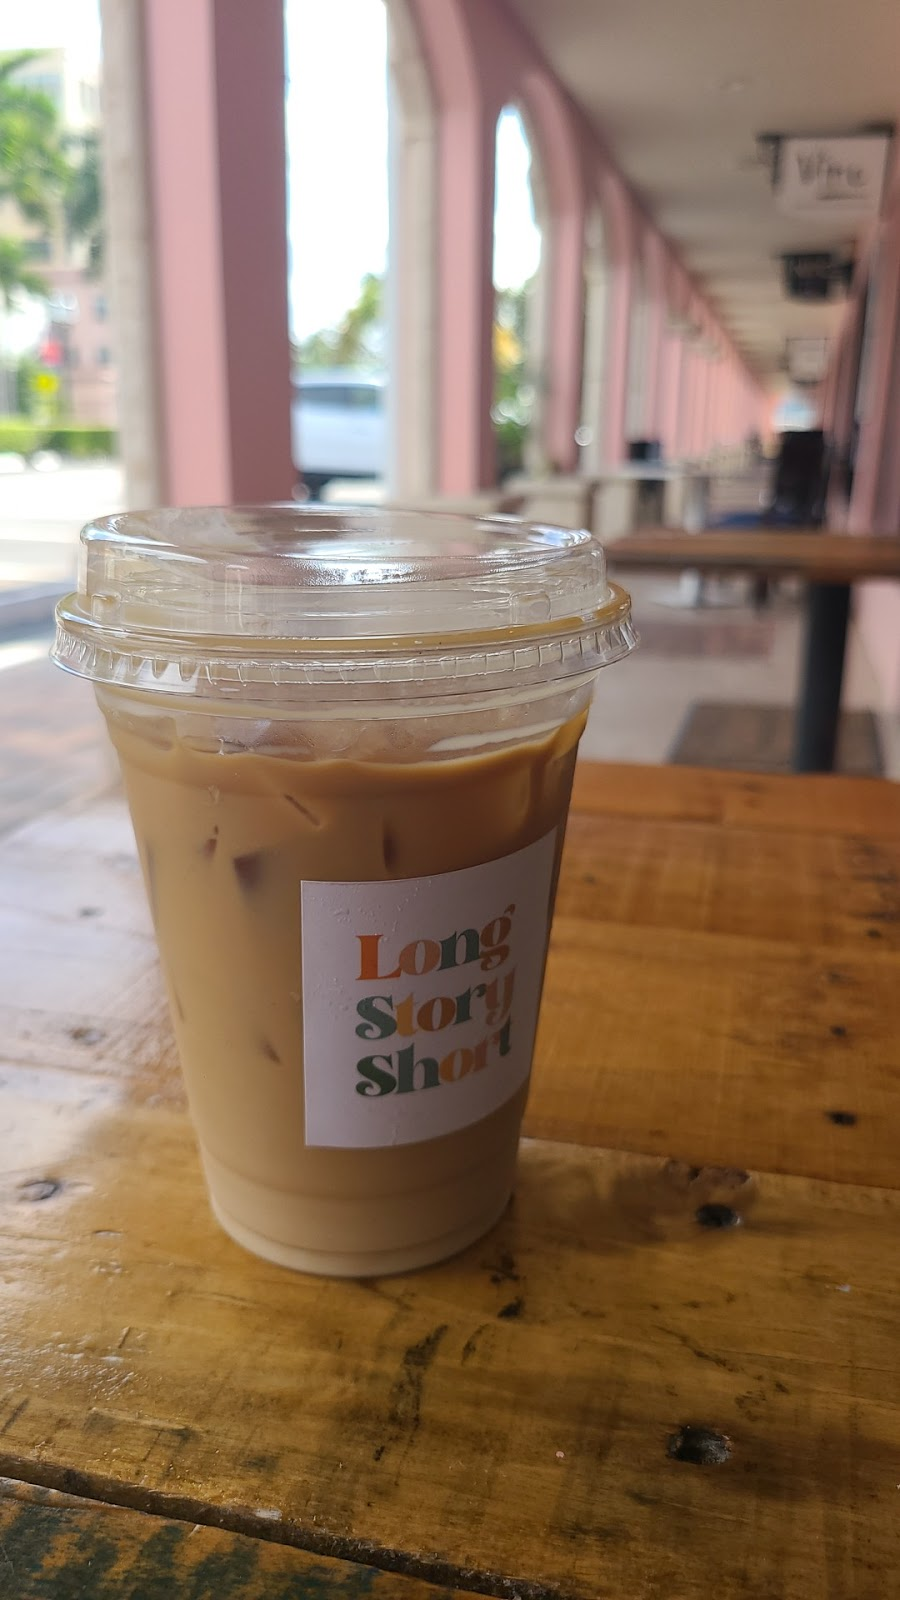 Long Story Short Cafe | cafe | 132 NE 2nd St, Boca Raton, FL 33432, USA | 5613342952 OR +1 561-334-2952